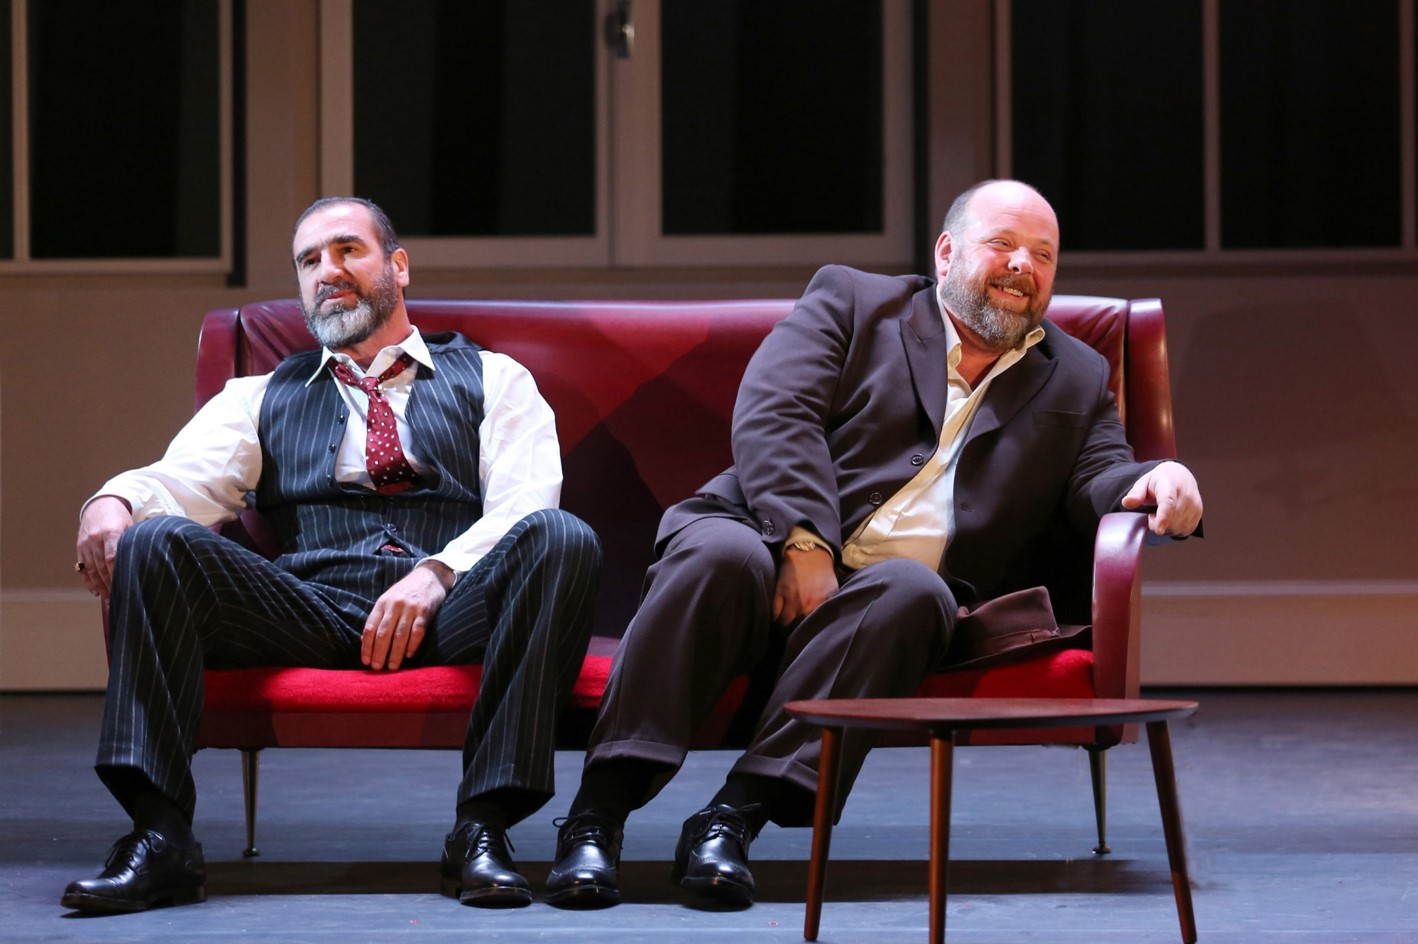 VICTOR - Image 2 Théâtre Hébertot Paris Octobre 2015 Gadebois Cantona - Go with the Blog